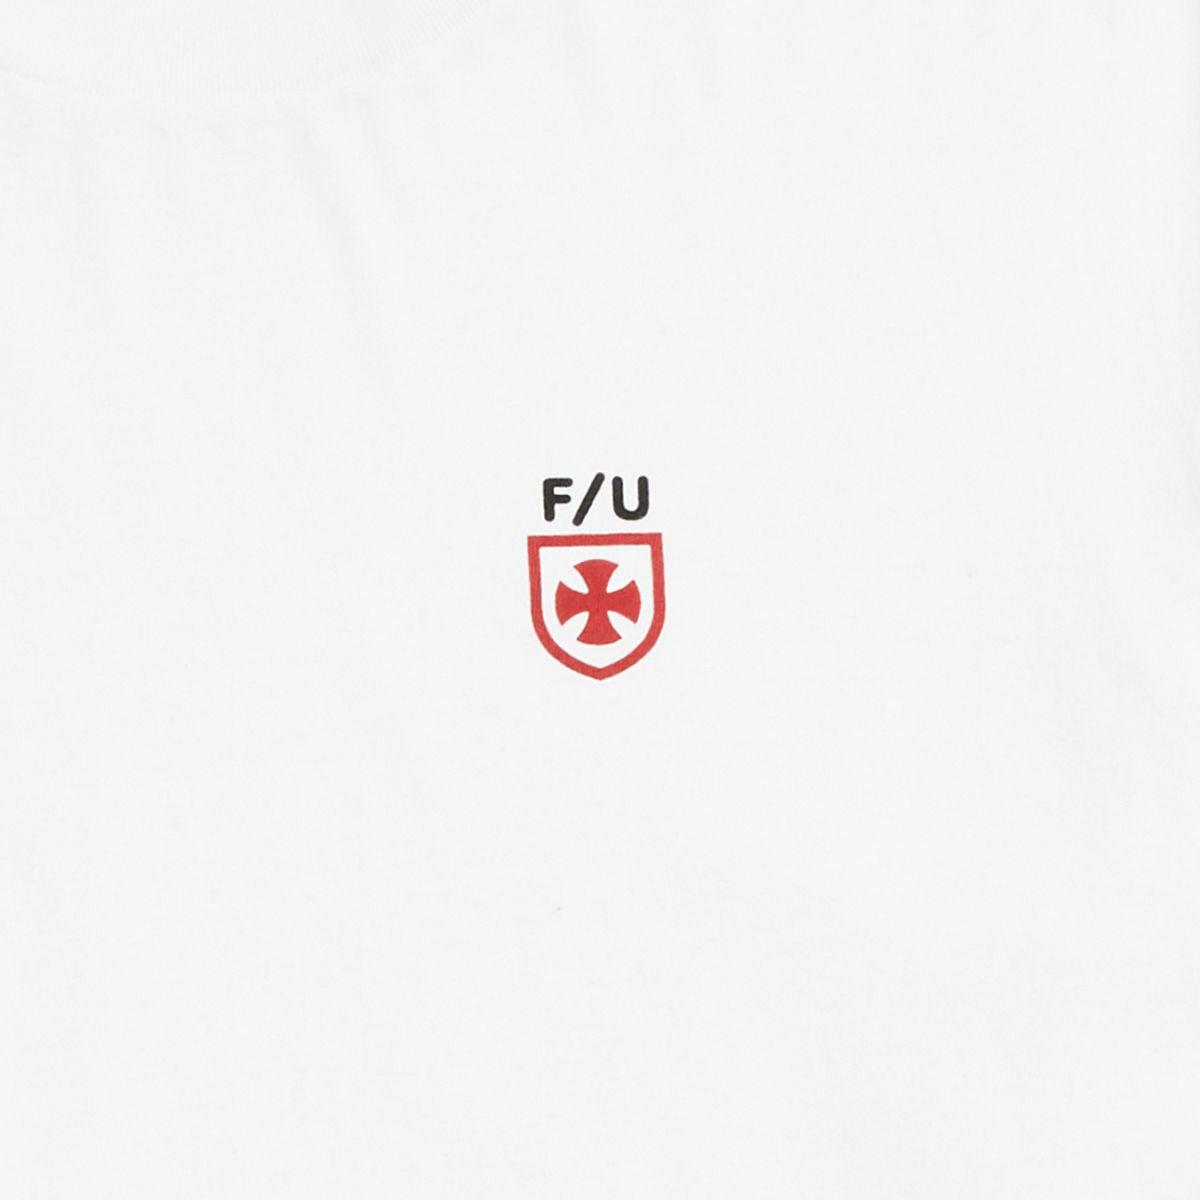 BRIXTON - T-SHIRT L S FRAME FRAME FRAME - bianca d76188